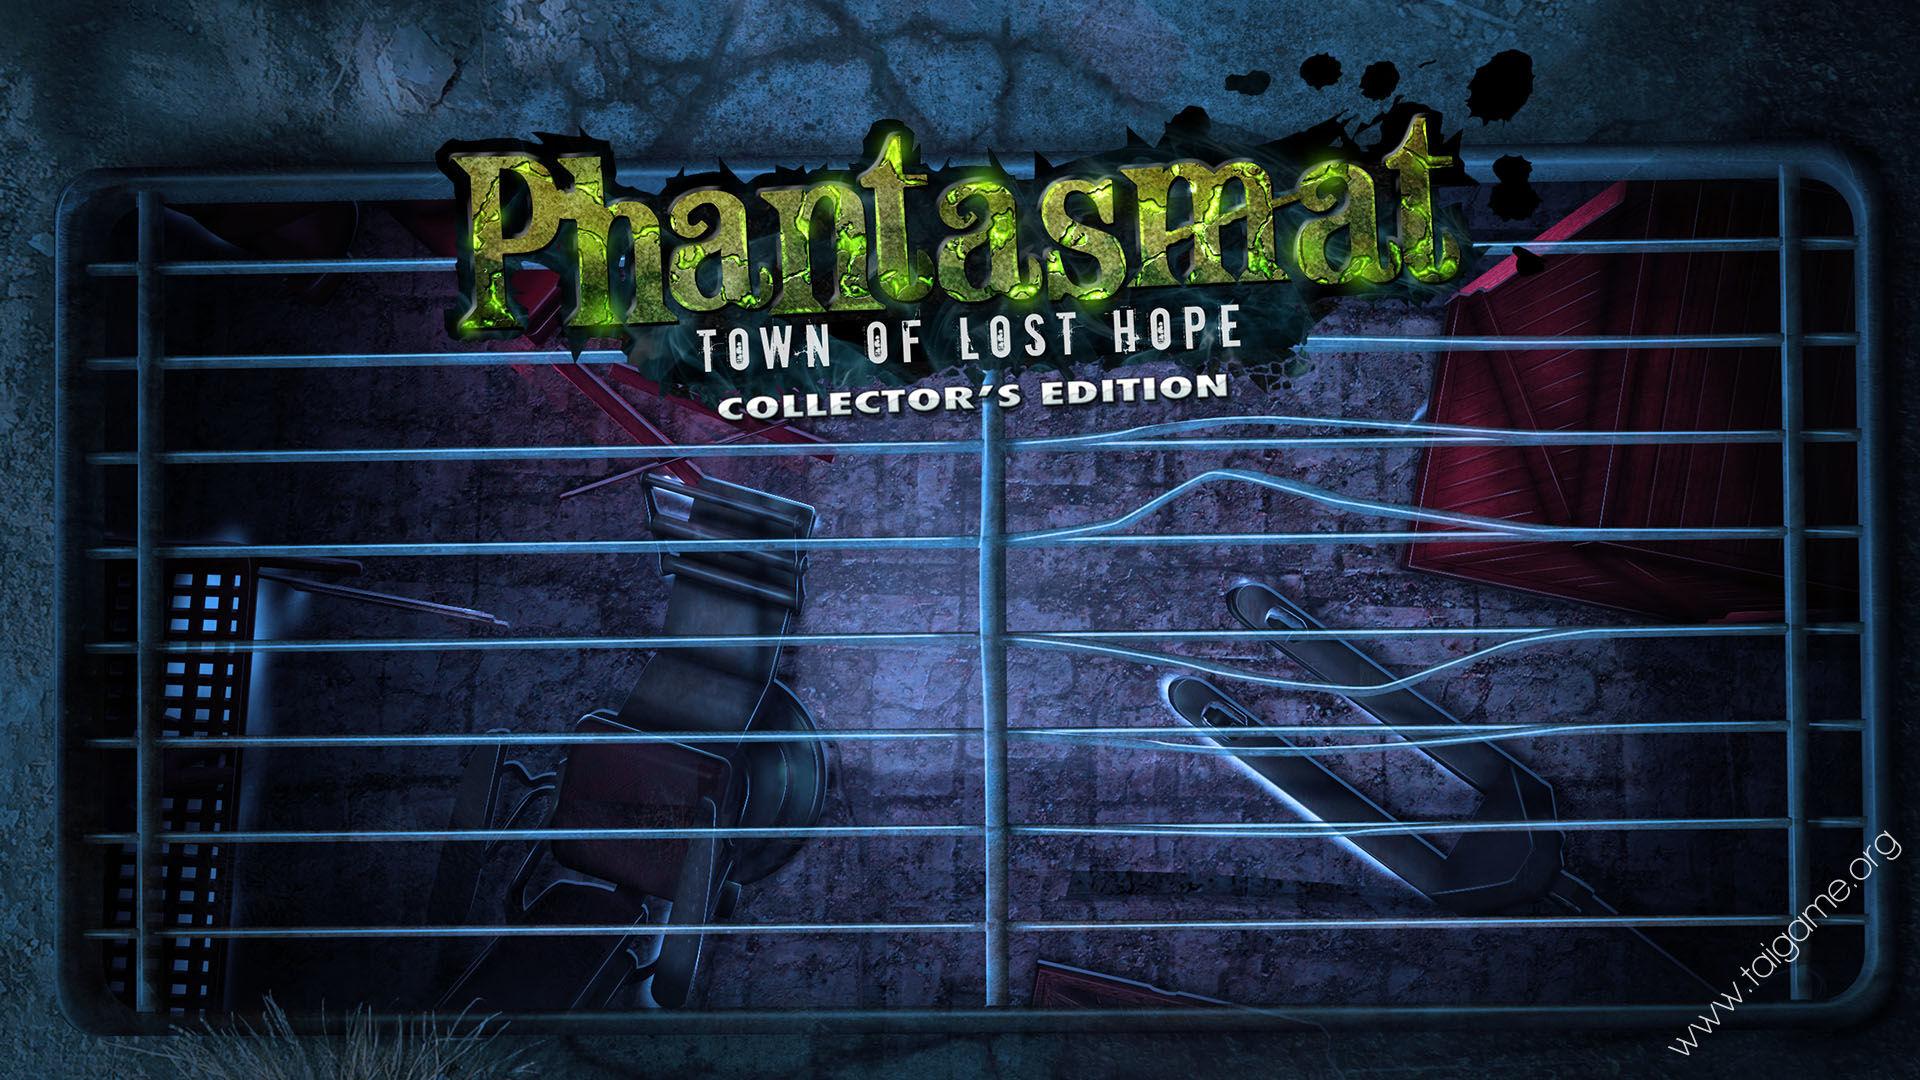 Phantasmat crucible peak collectors edition.2017.pc